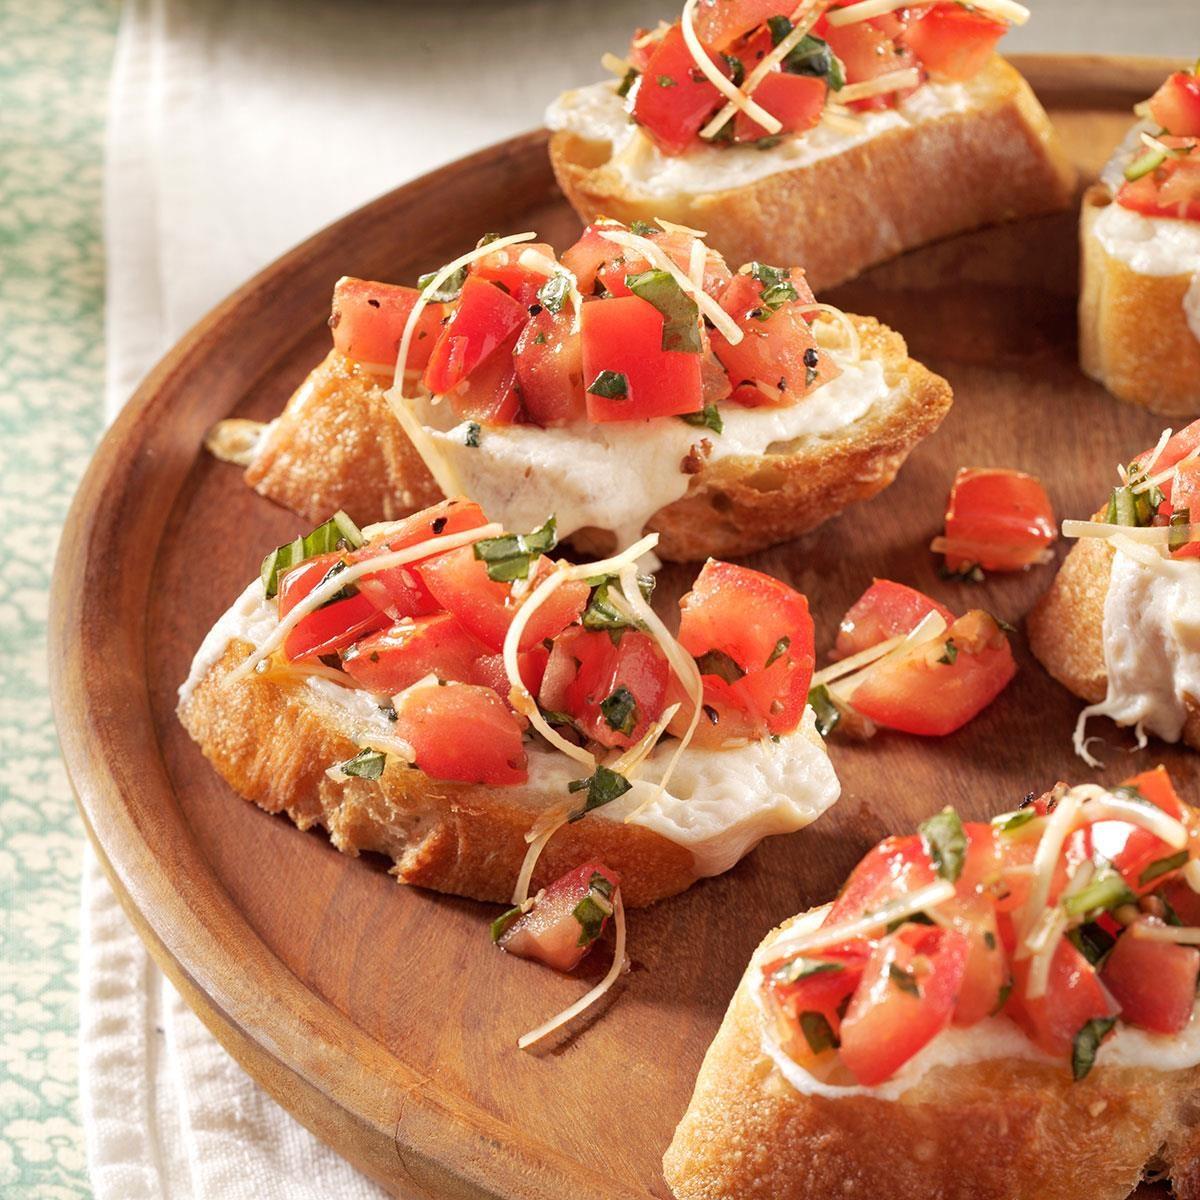 simple appetizers | taste of home